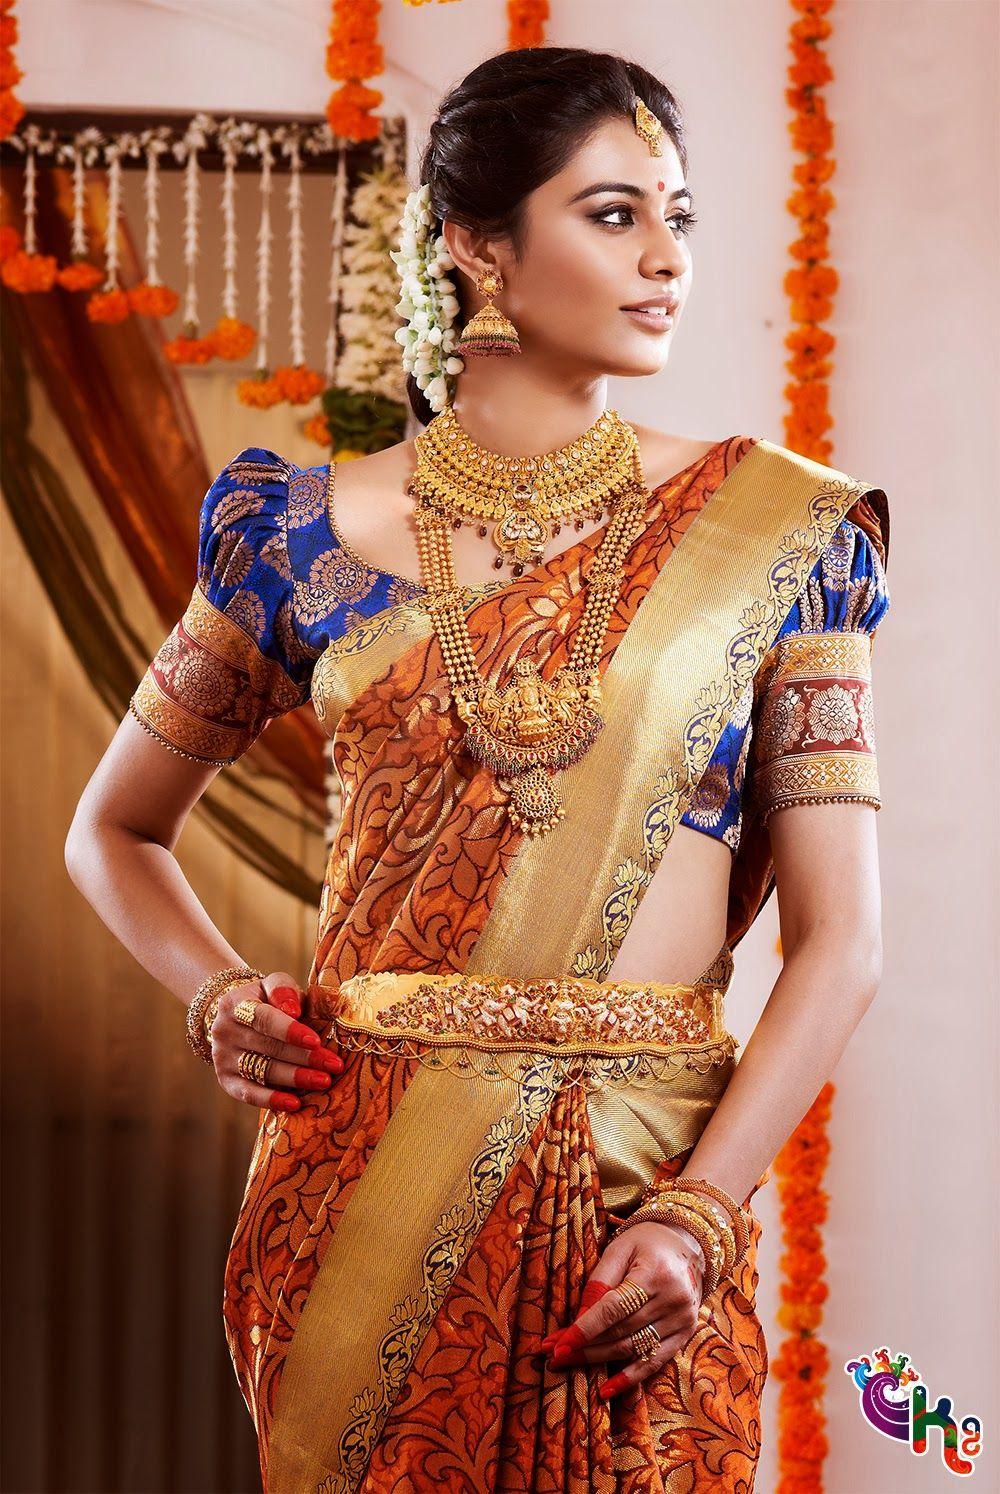 Jyothika traditional sari at shobi wedding saree blouse patterns - Traditional Southern Indian Bride Wearing Bridal Saree Jewellery And Makeup Interesting With The Contrast Of The Blouse And Sari